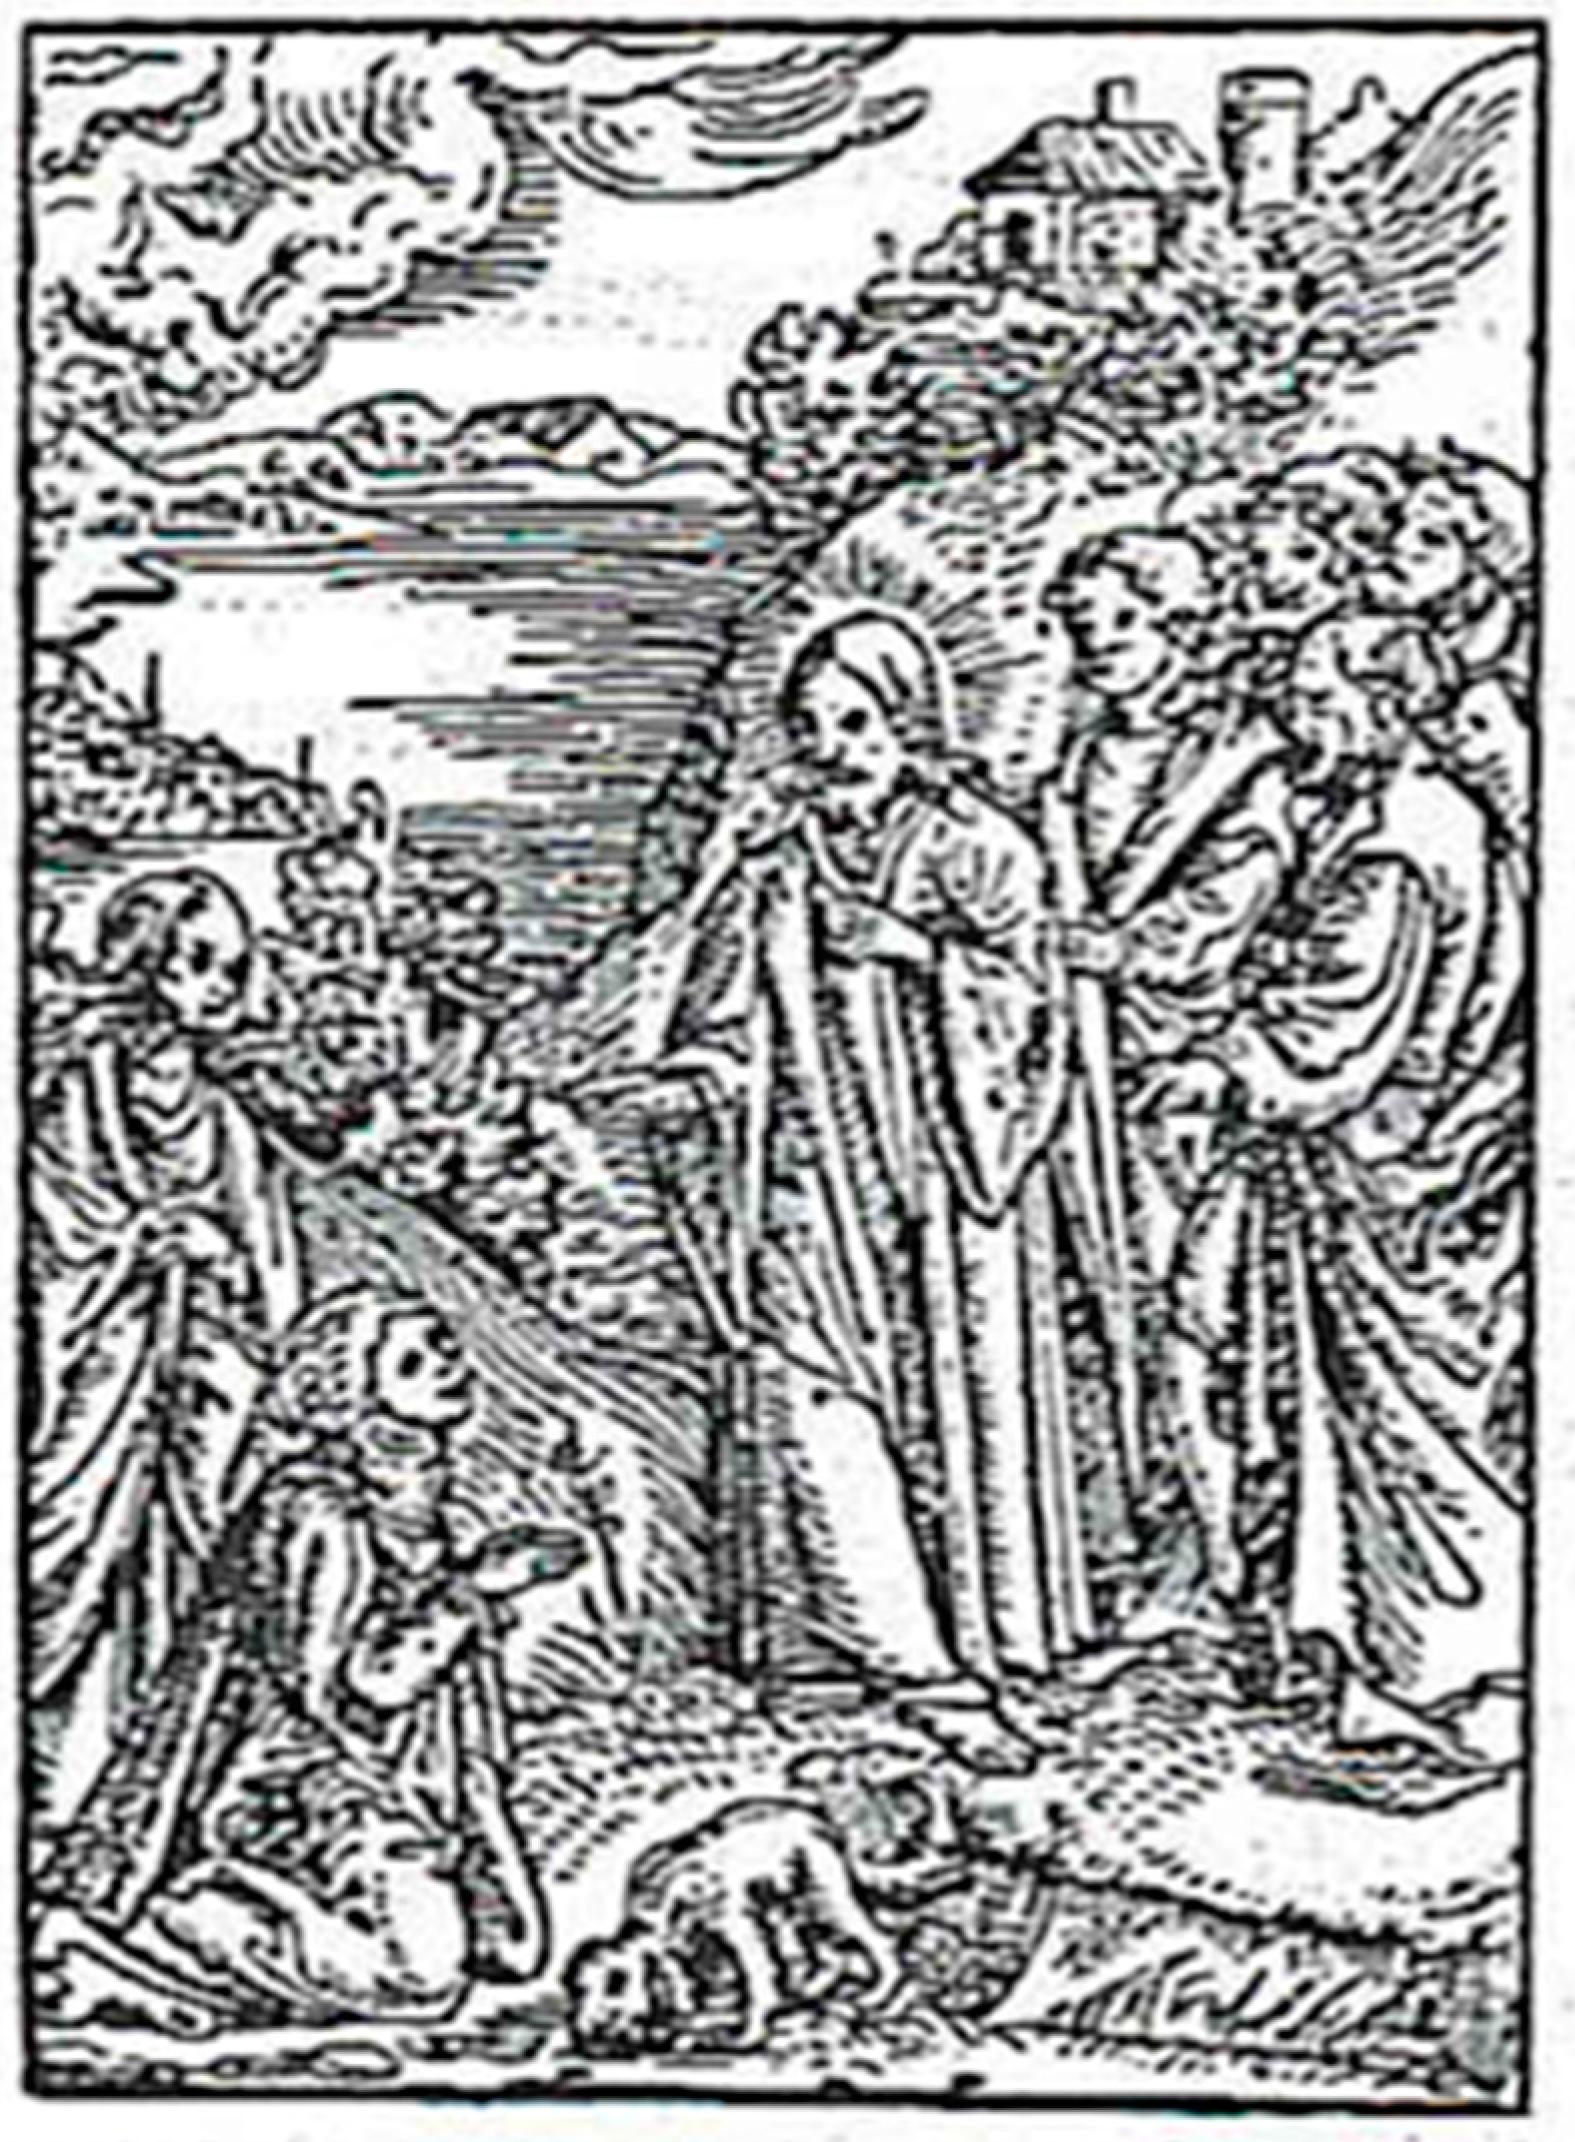 Cranach's Woodcut